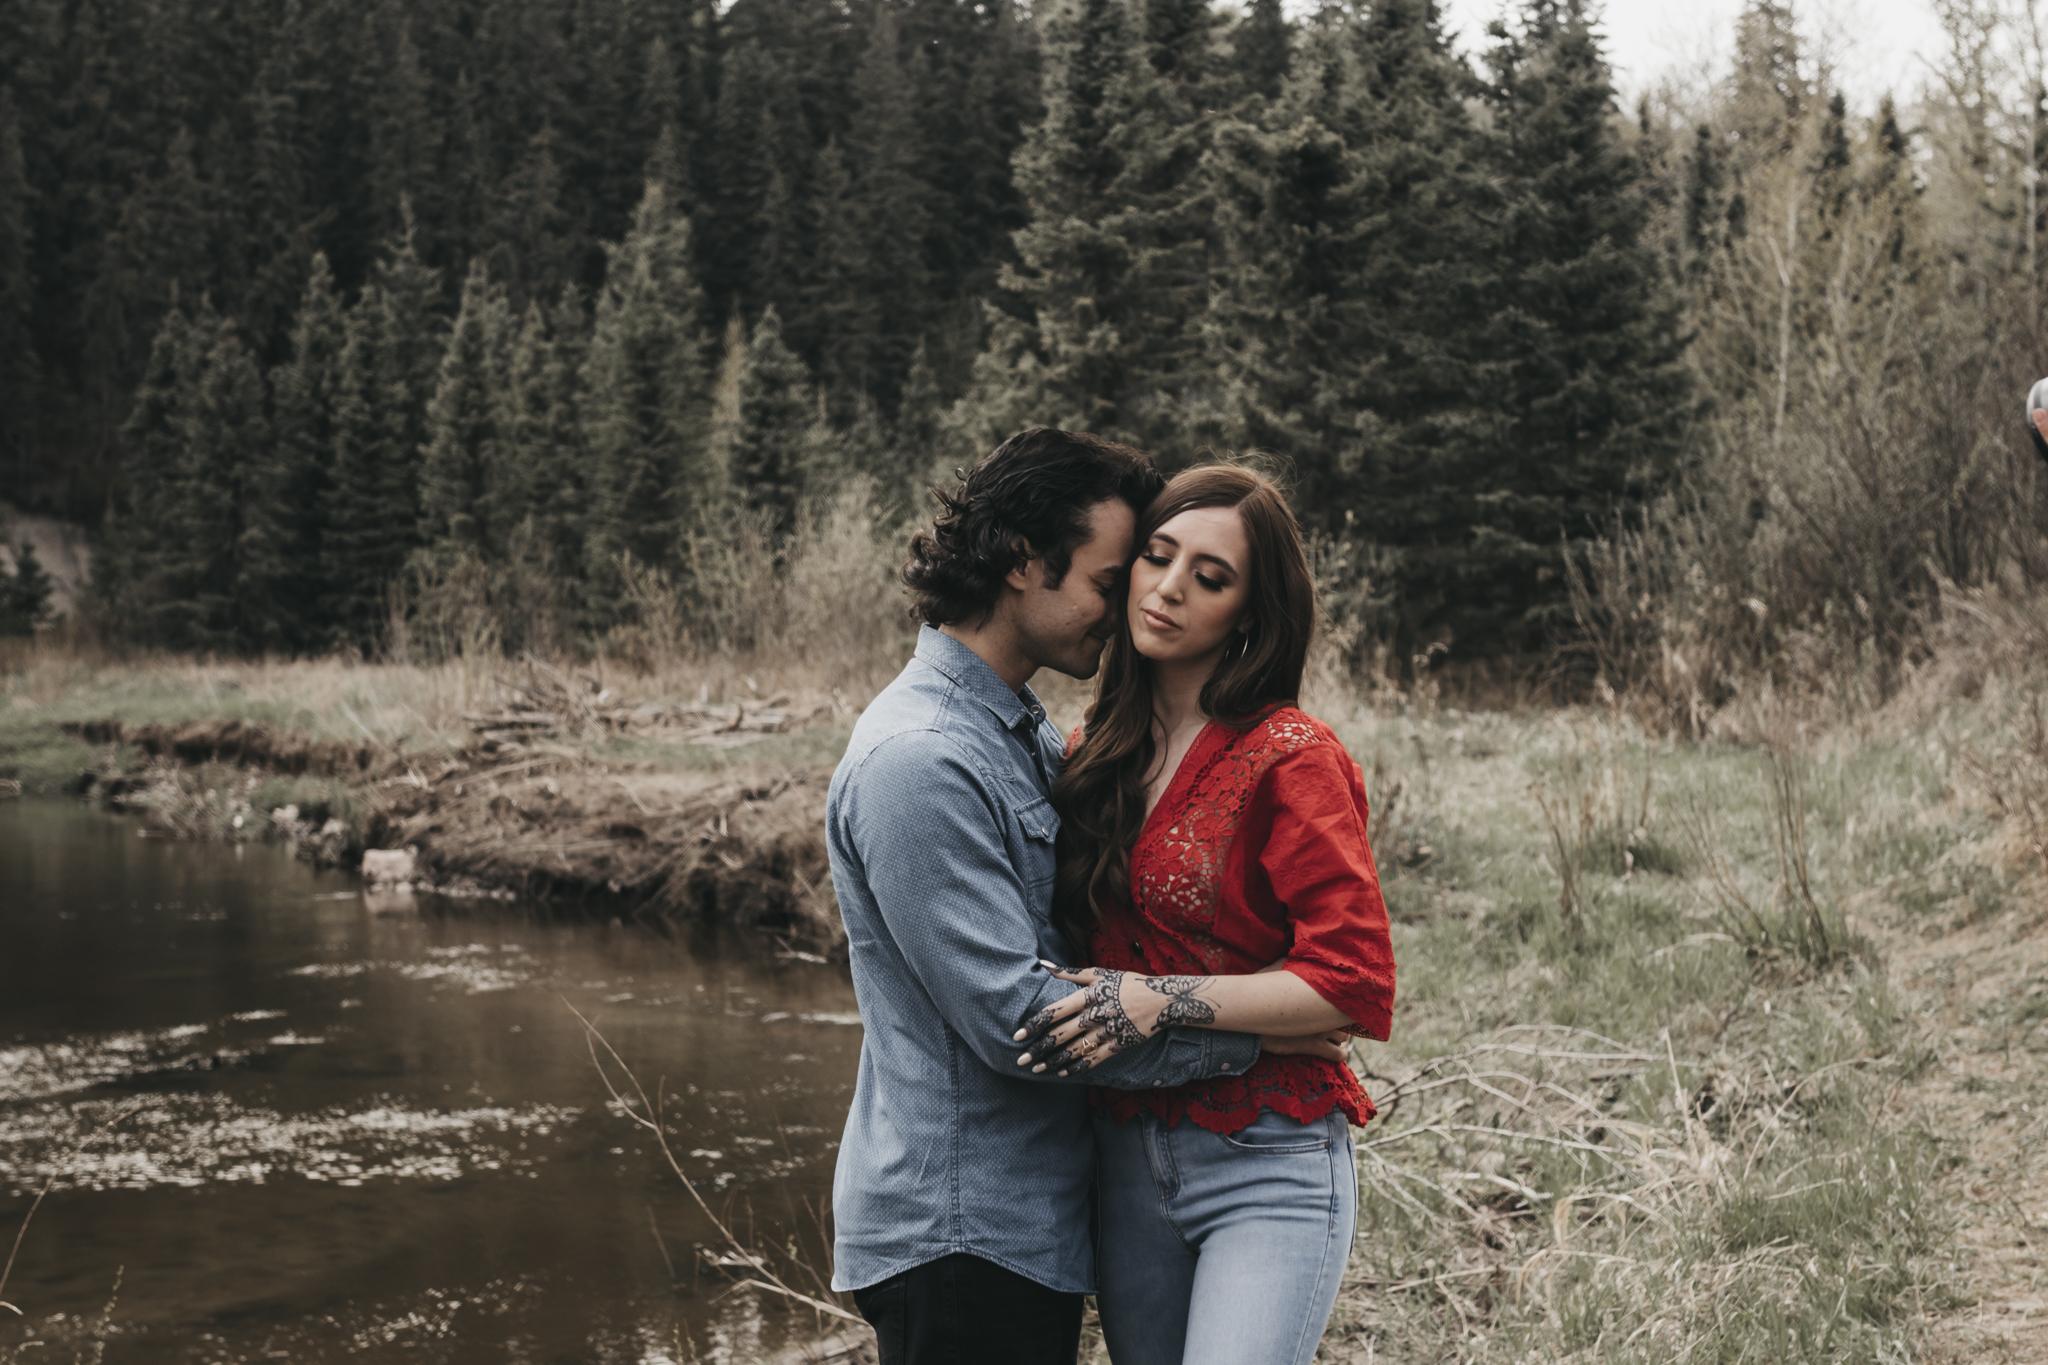 Angela & Robby | Life Unposed Workshop | Edmonton Photographer